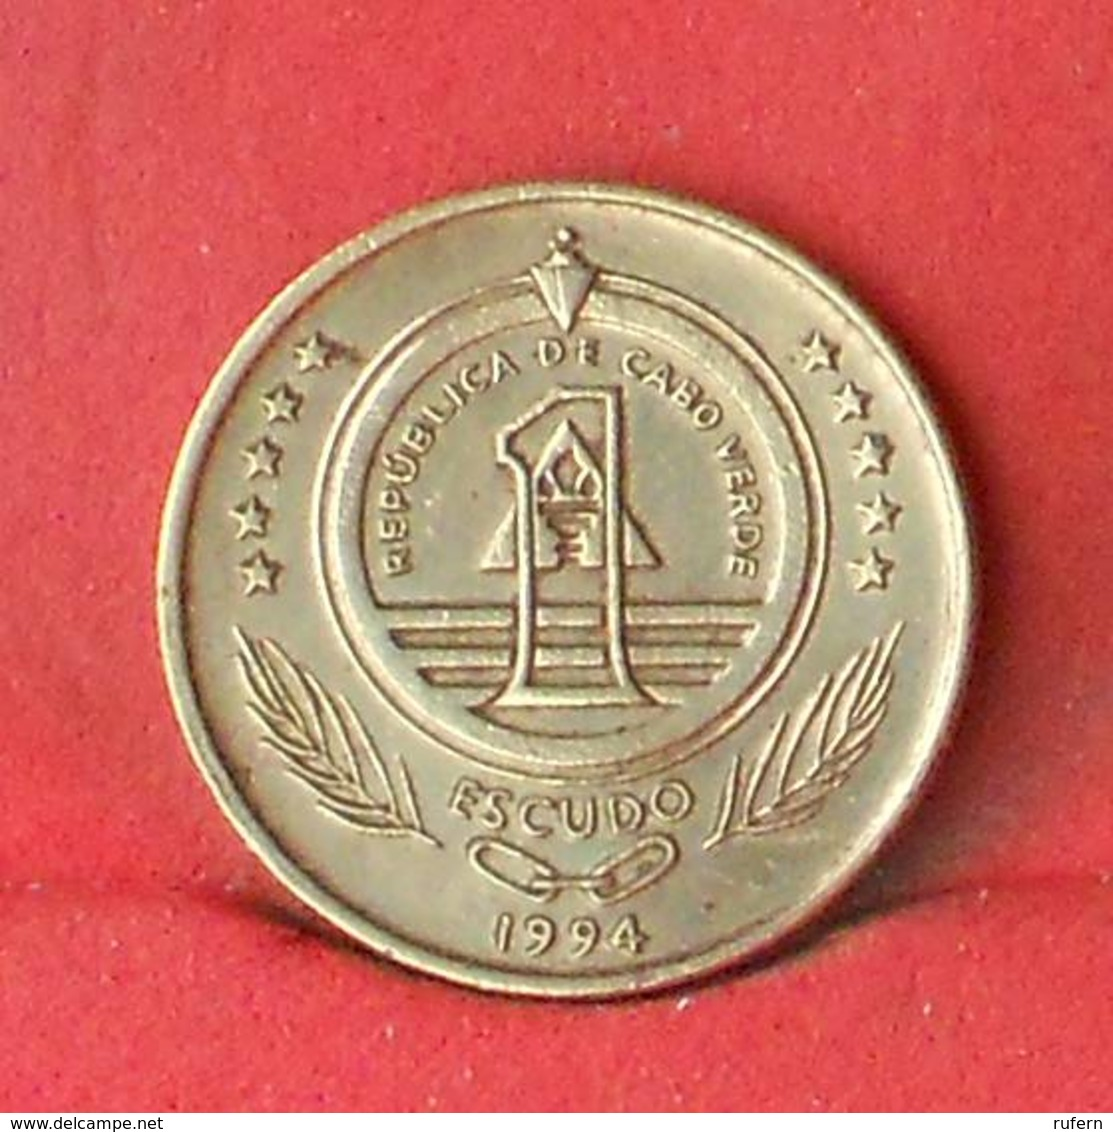 CAPE VERDE 1 ESCUDOS 1994 -    KM# 27 - (Nº28135) - Cap Vert